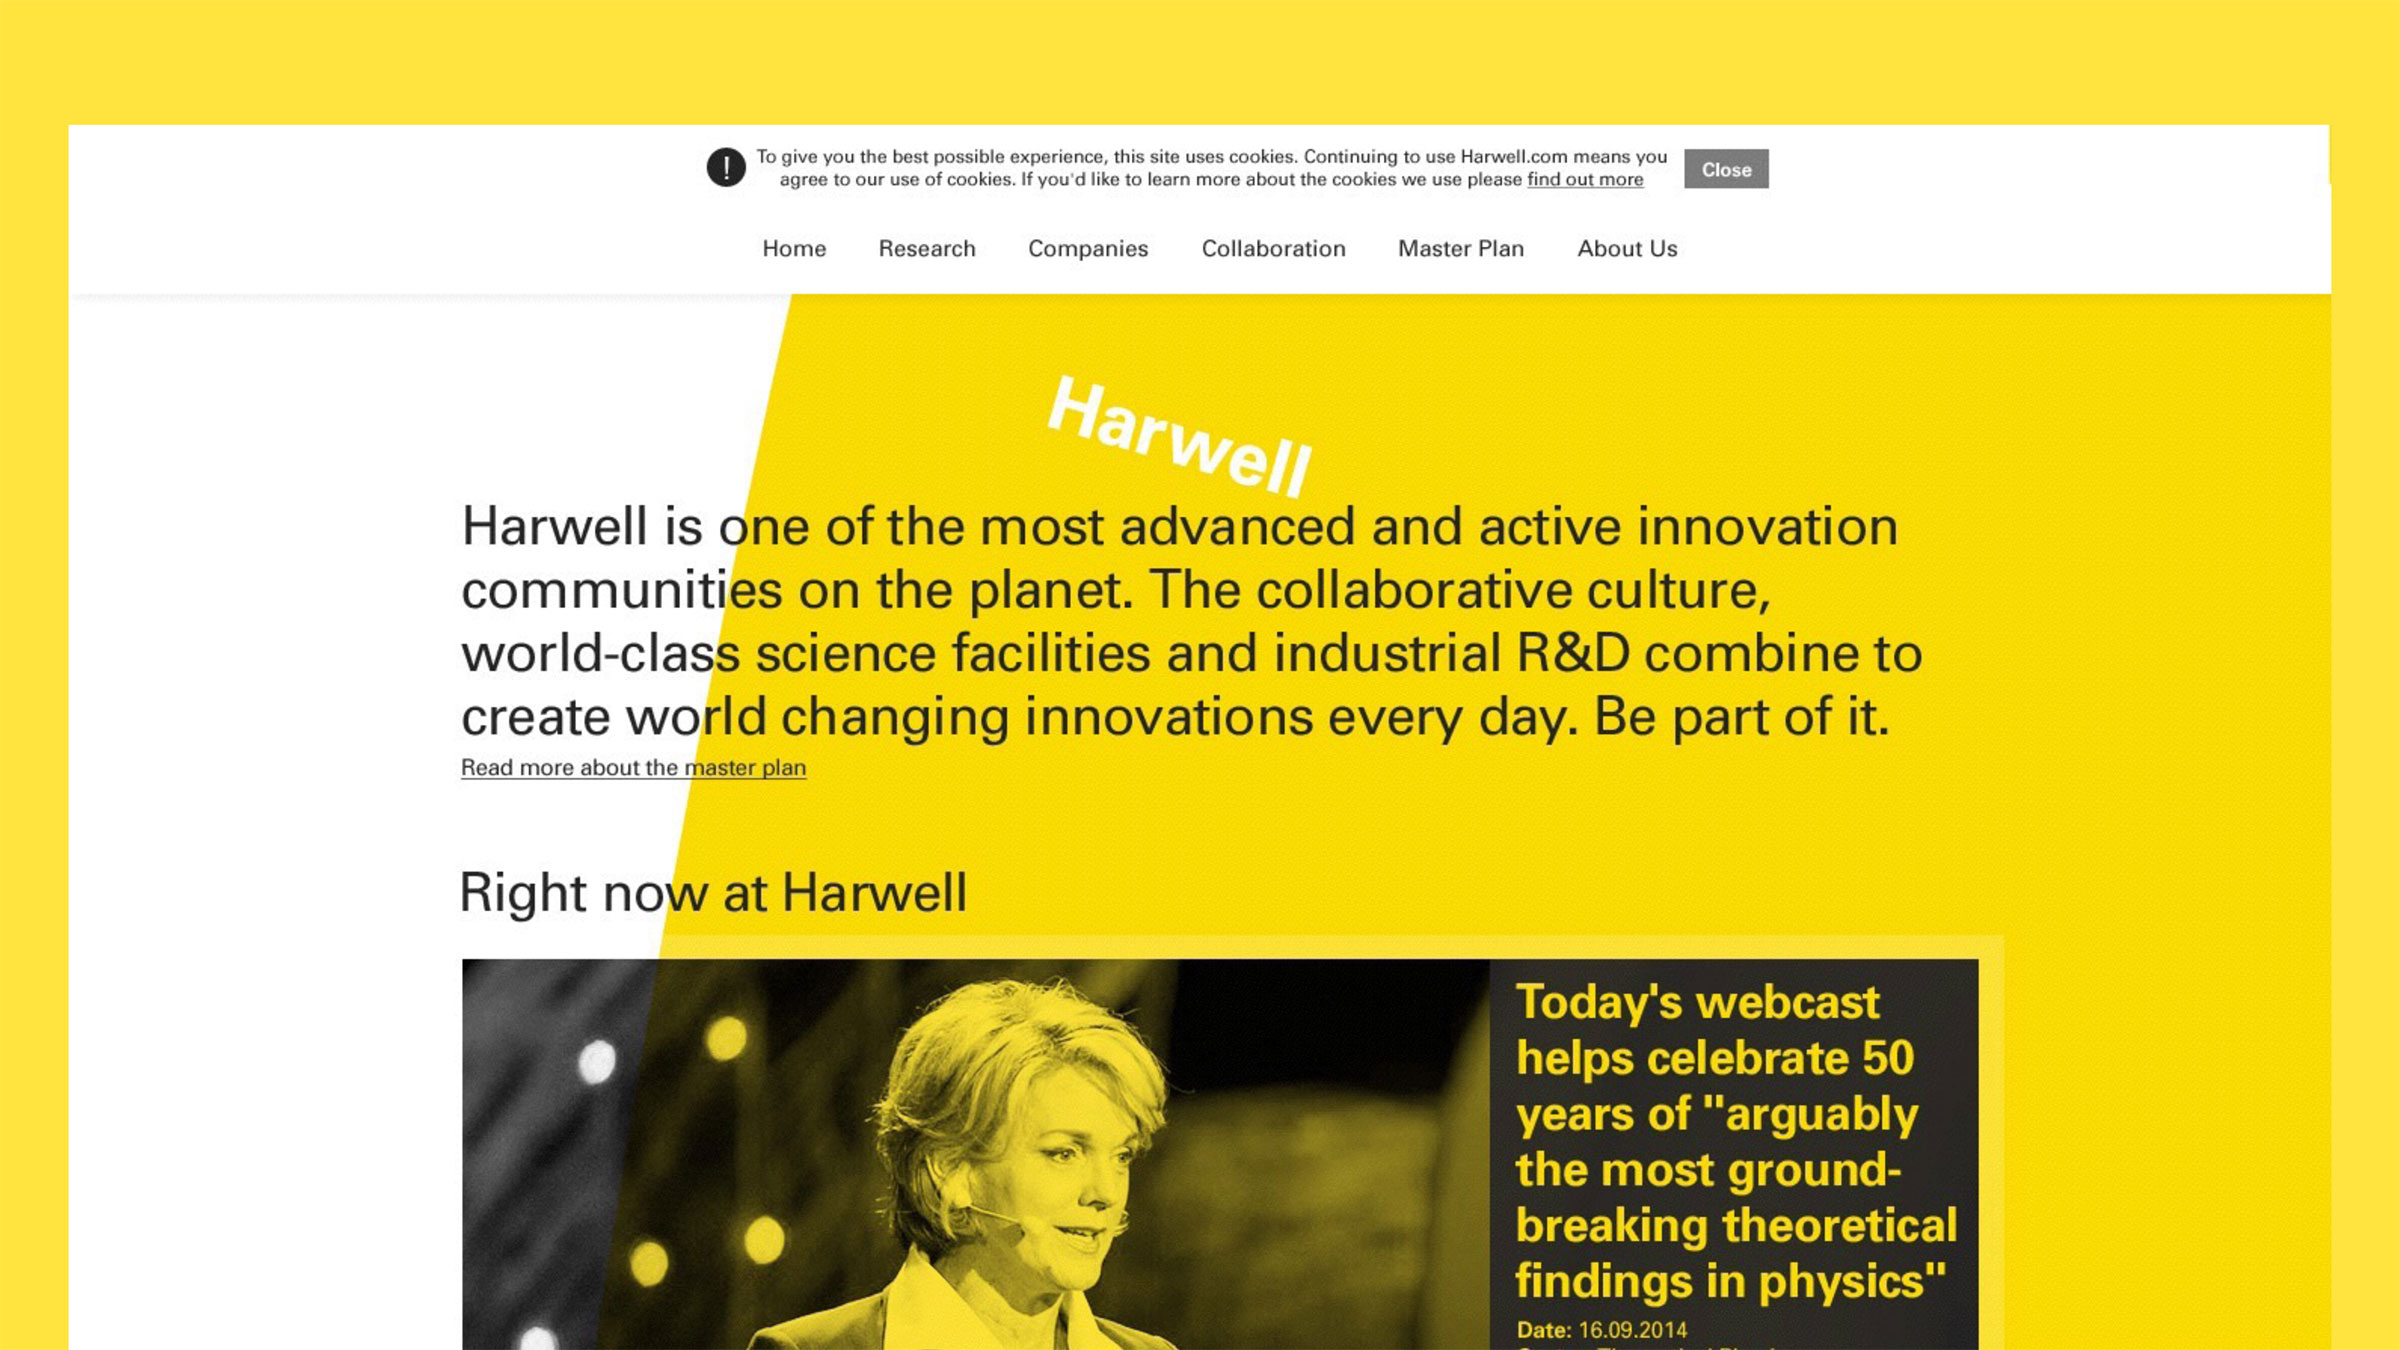 RH-harwell-2.jpg